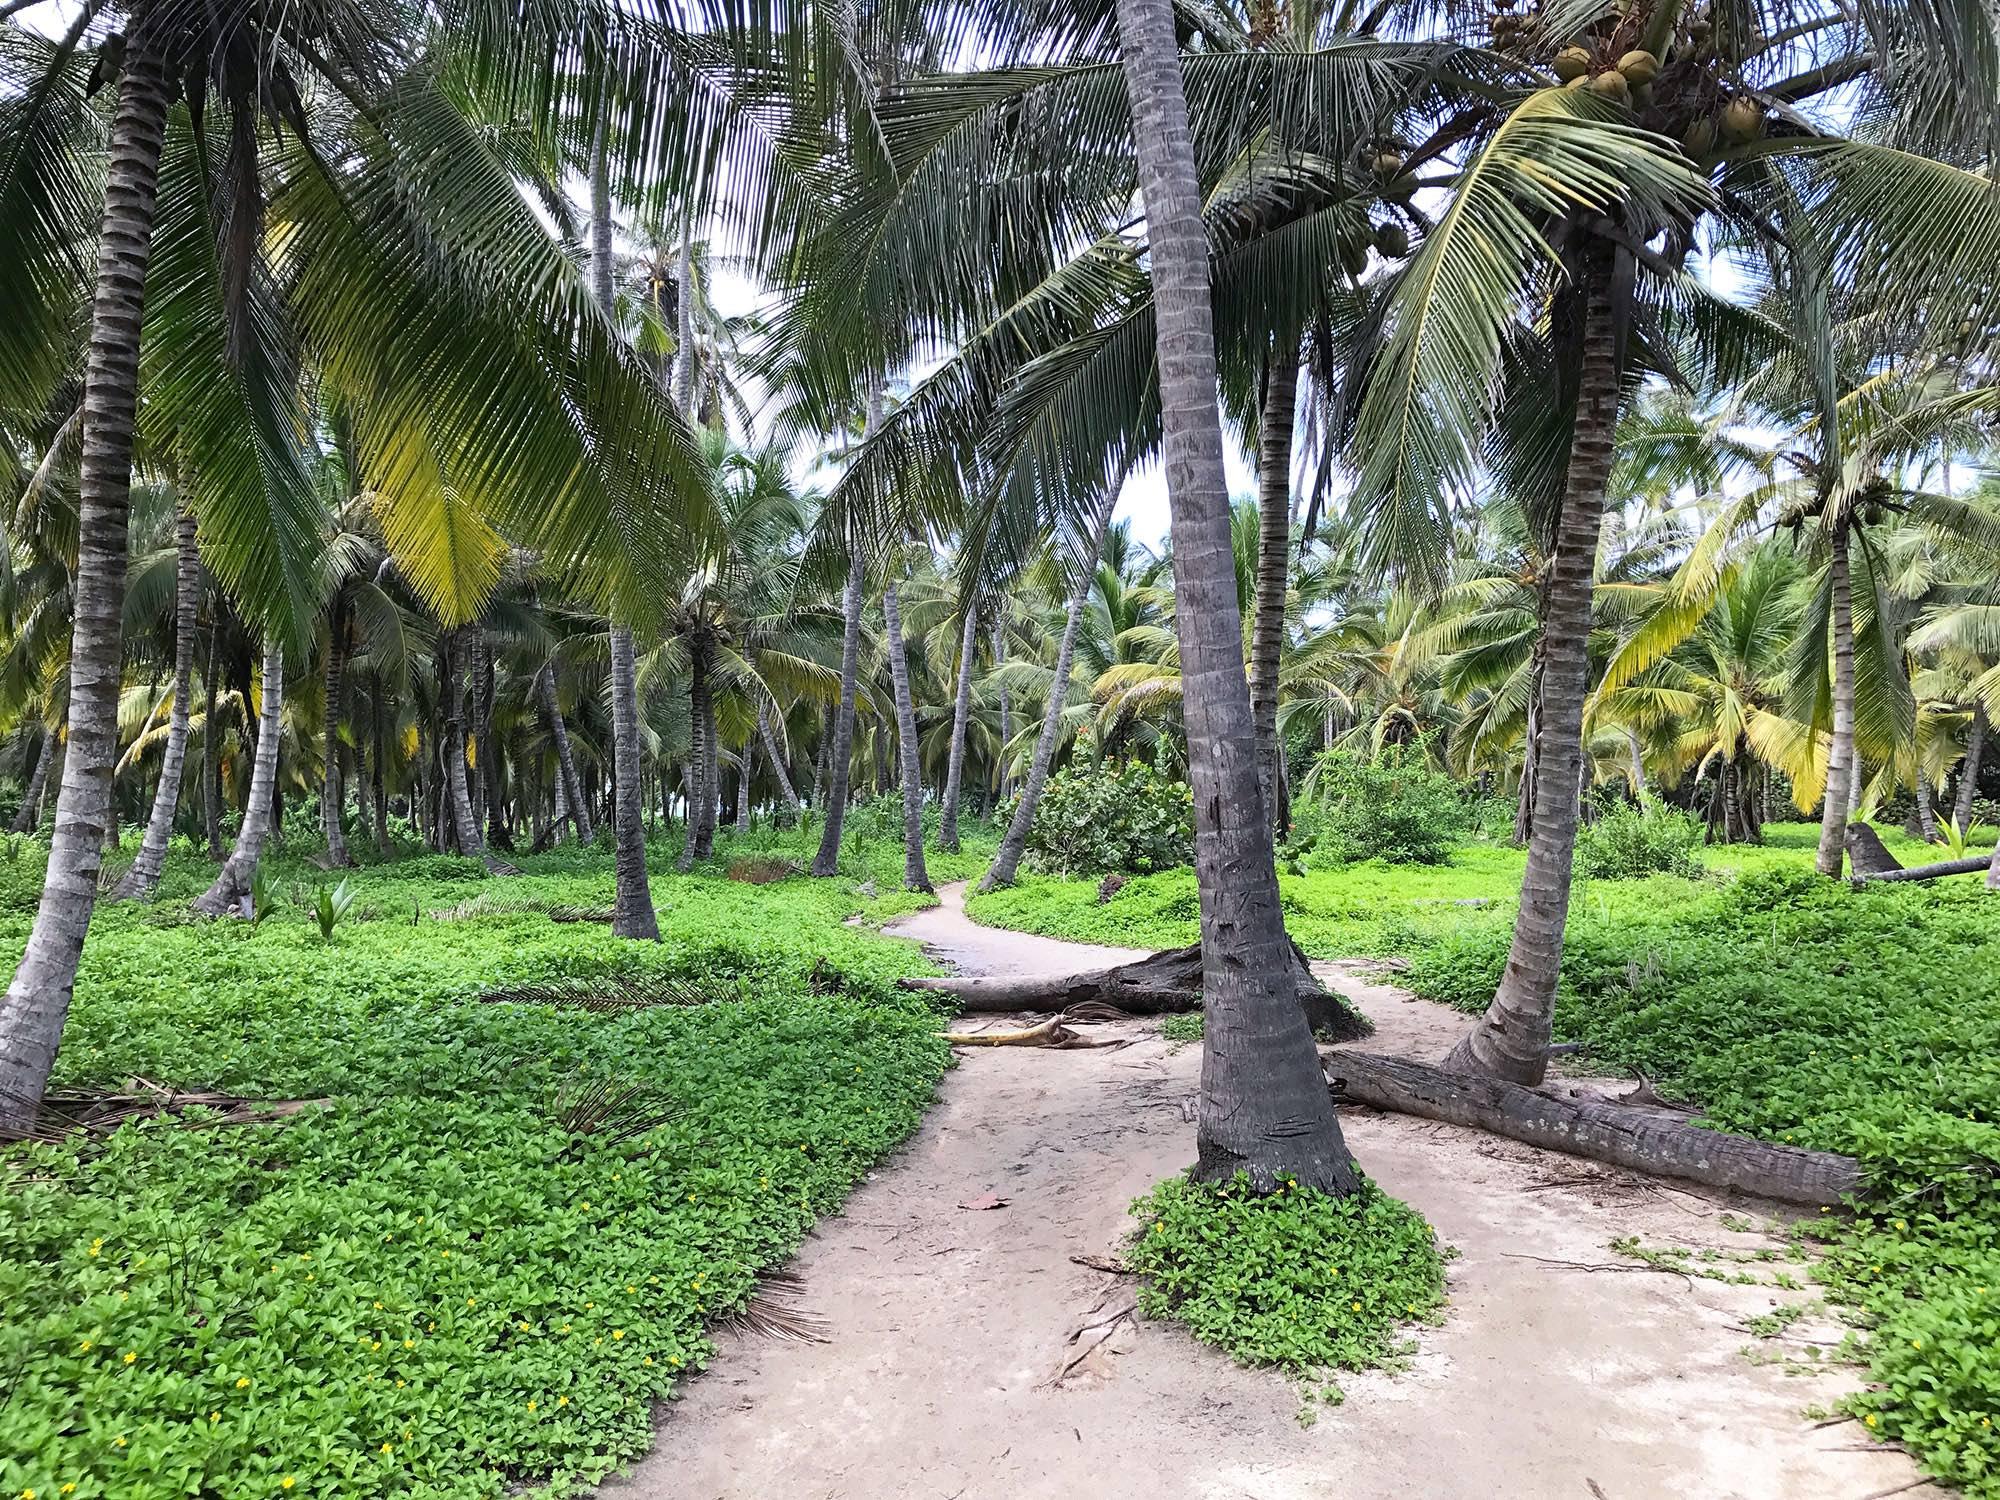 Tayrona National Park Colombia palm trees